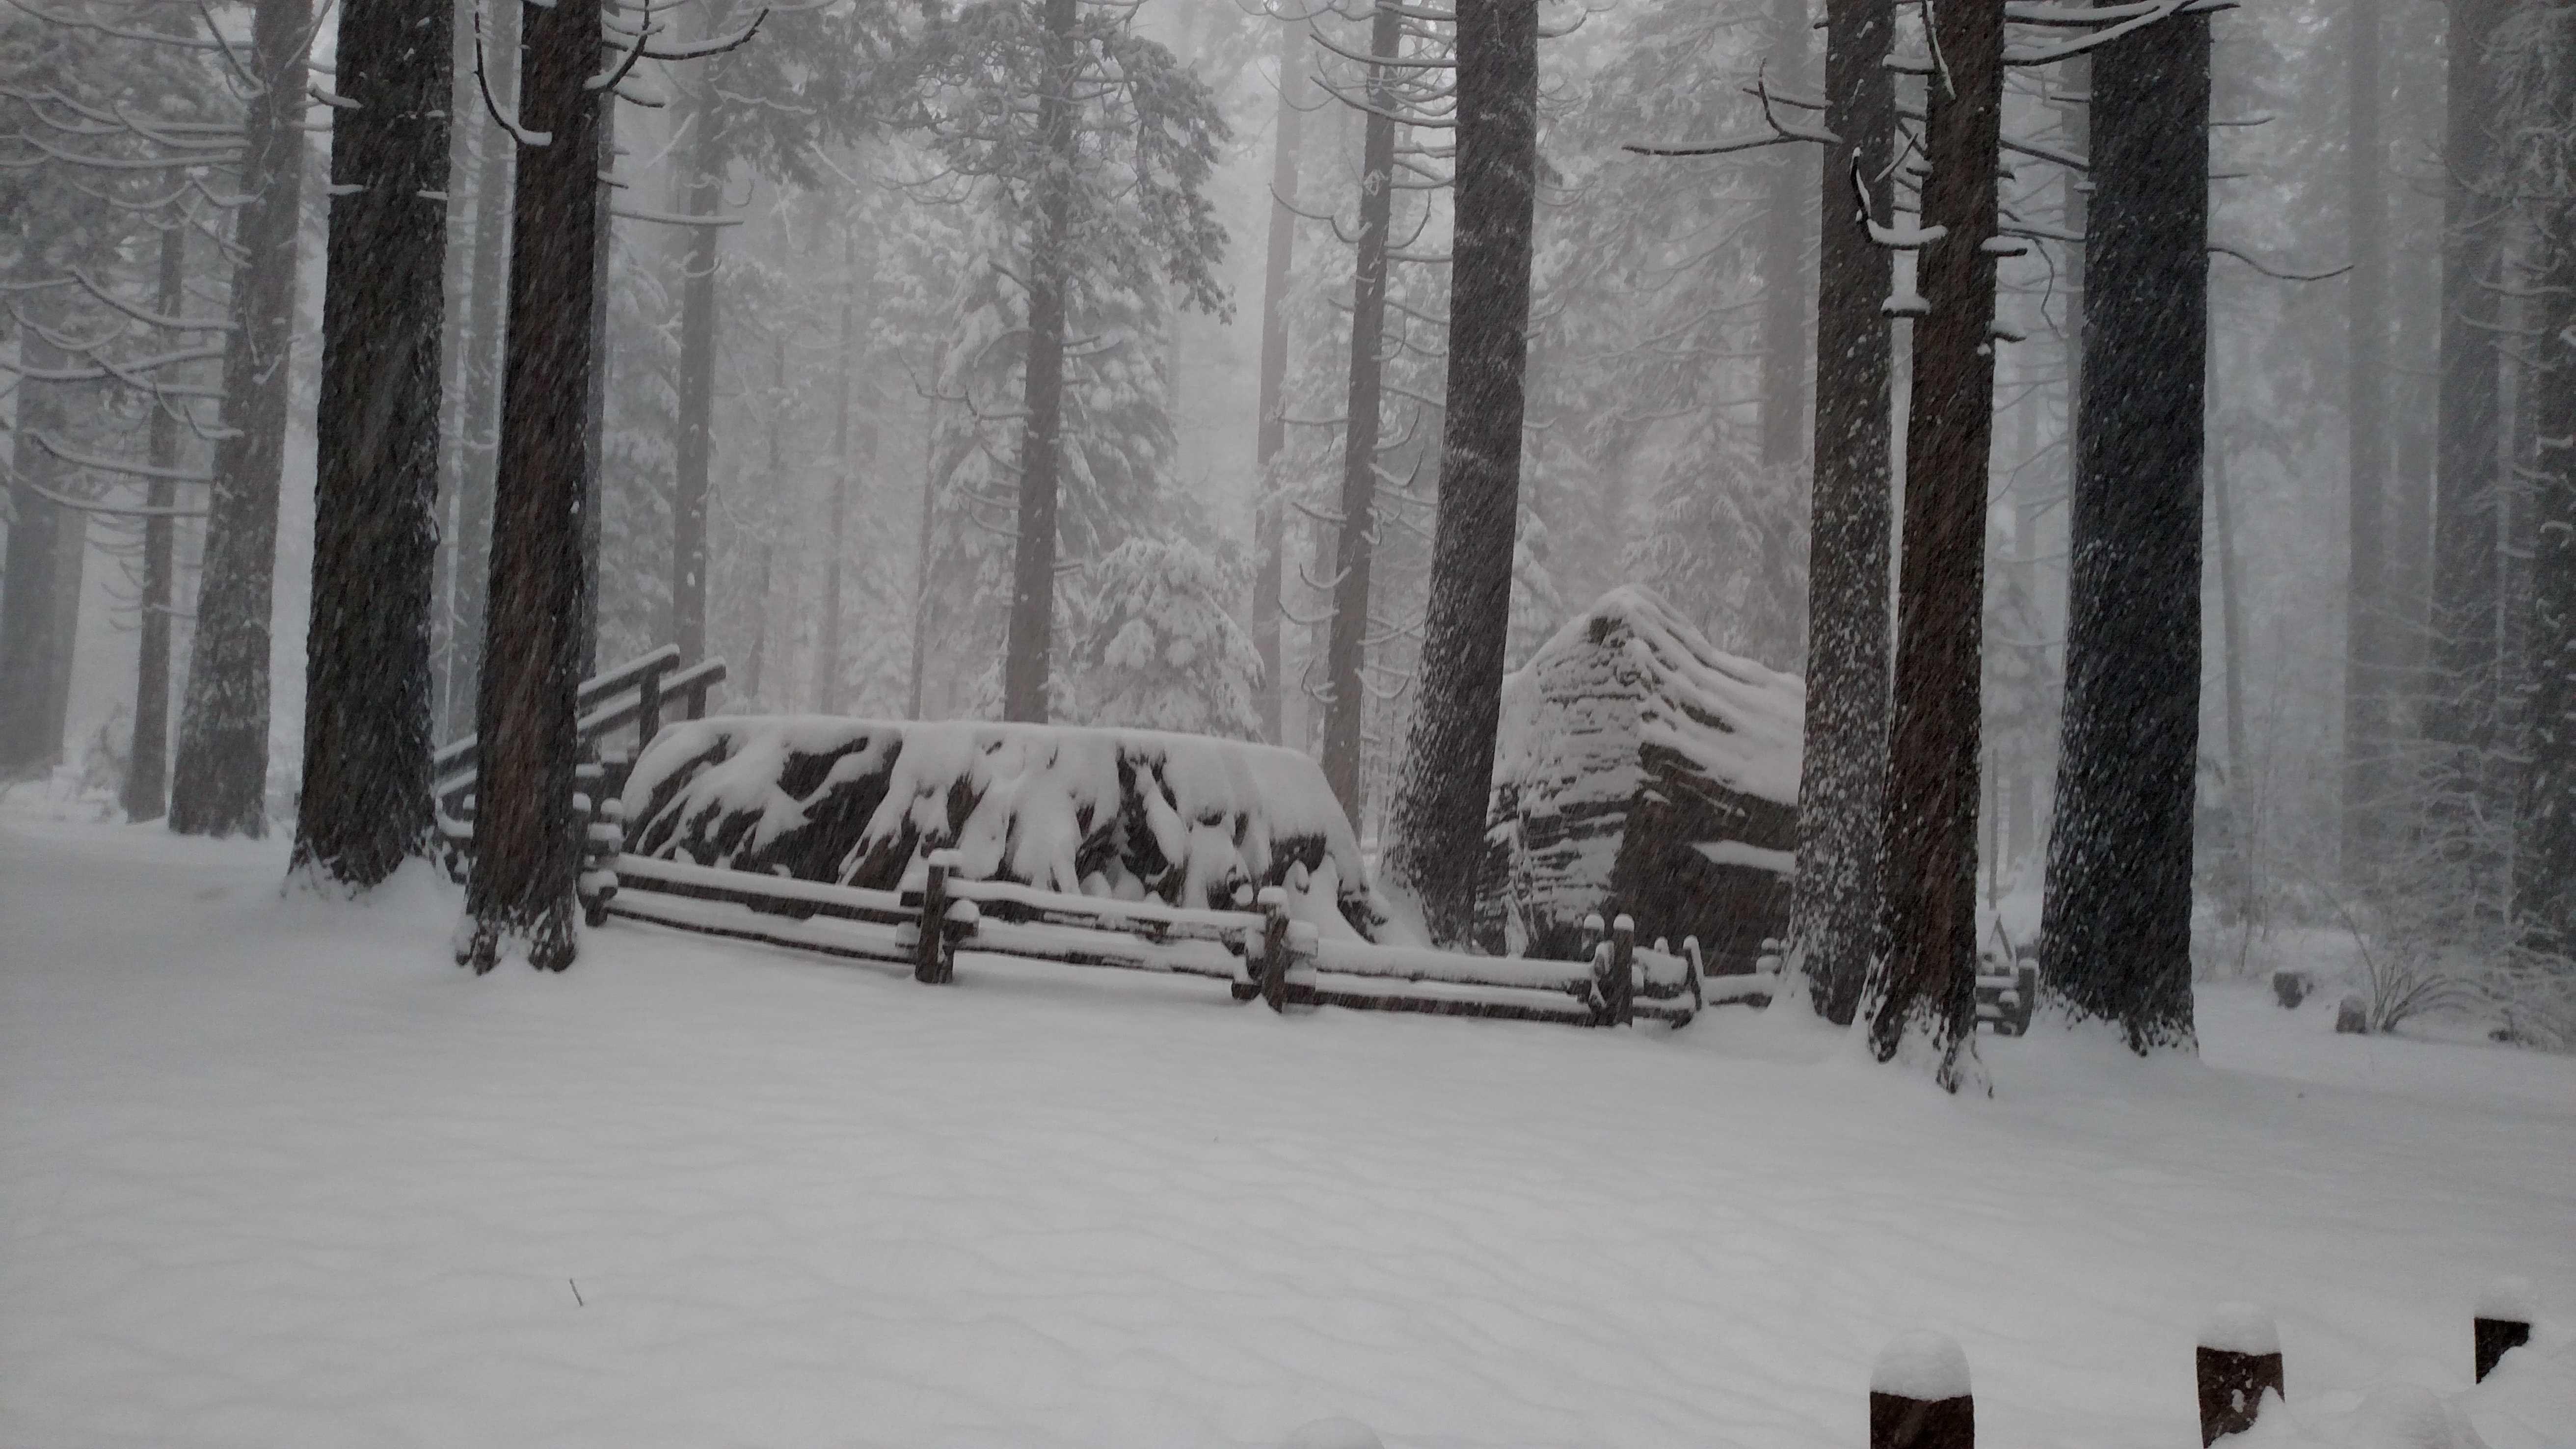 Snow on the Sentinel Tree at Calaveras Big Trees State Park. (Dec. 24, 2015)